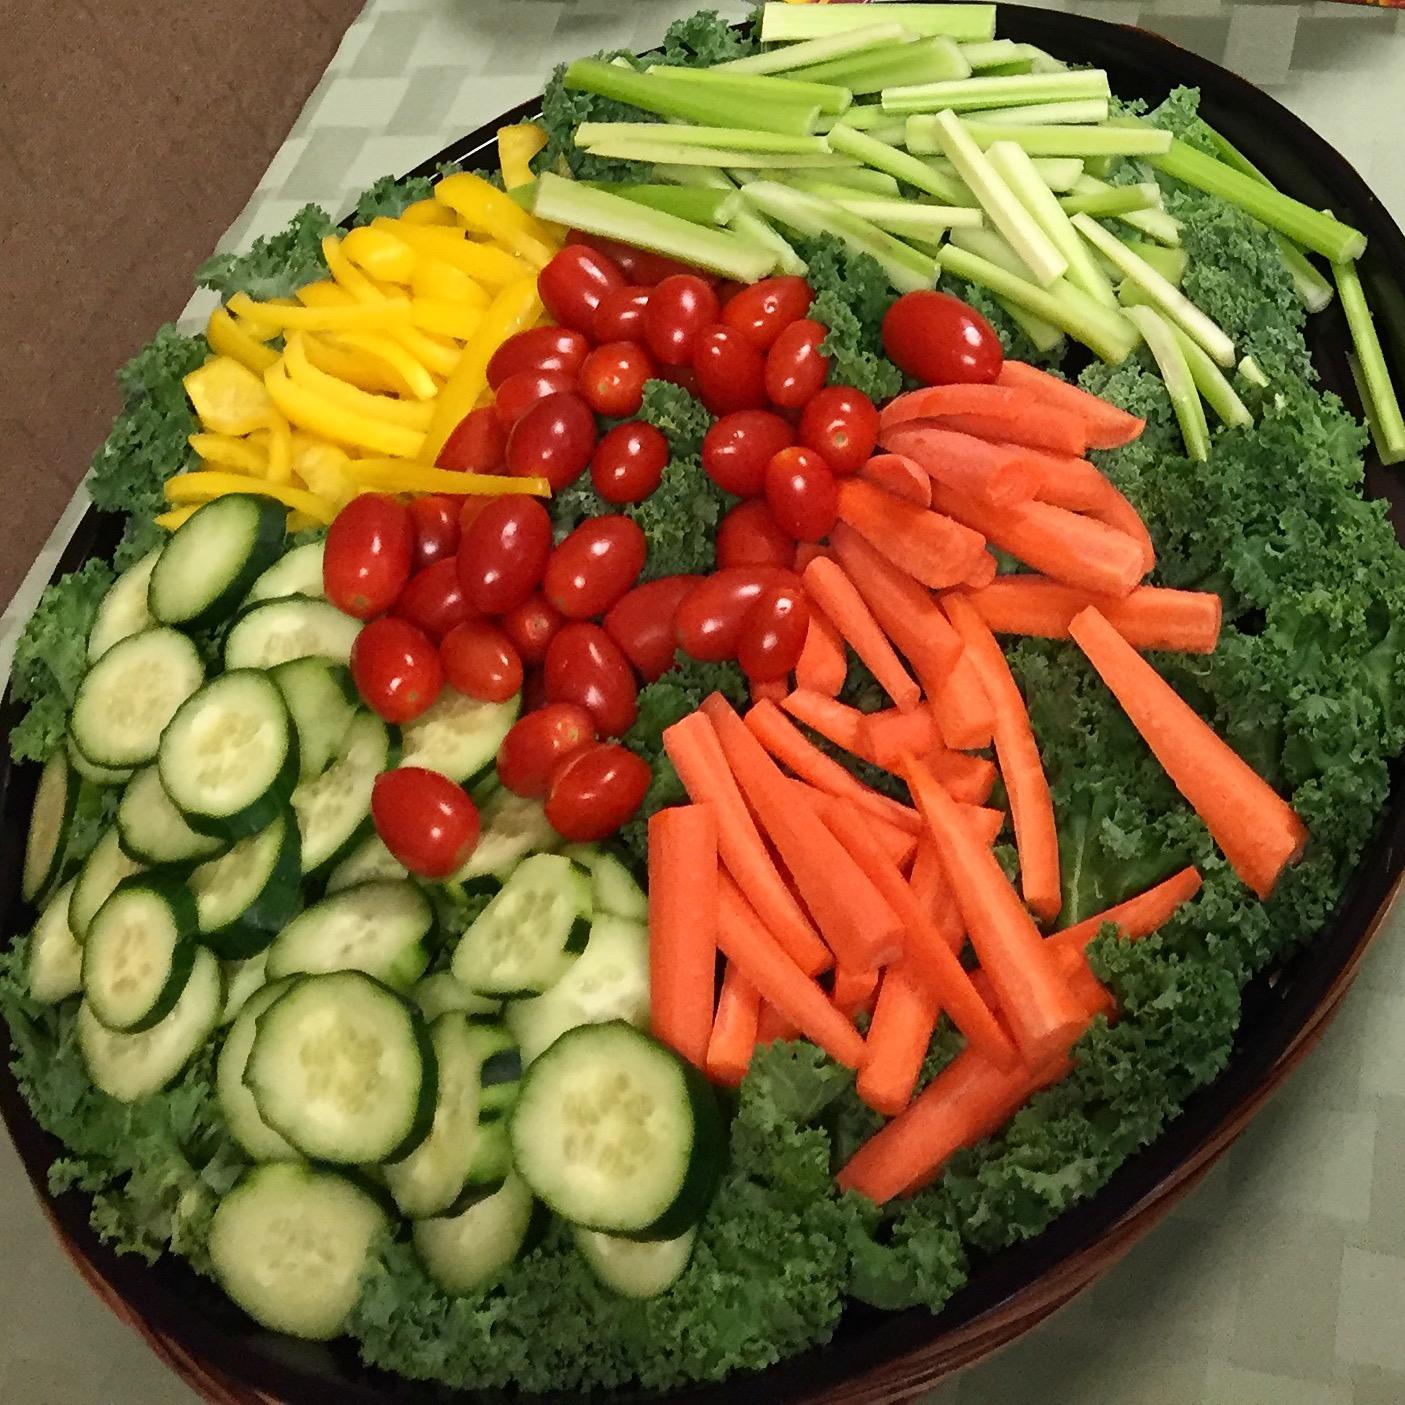 quality_food_veggies